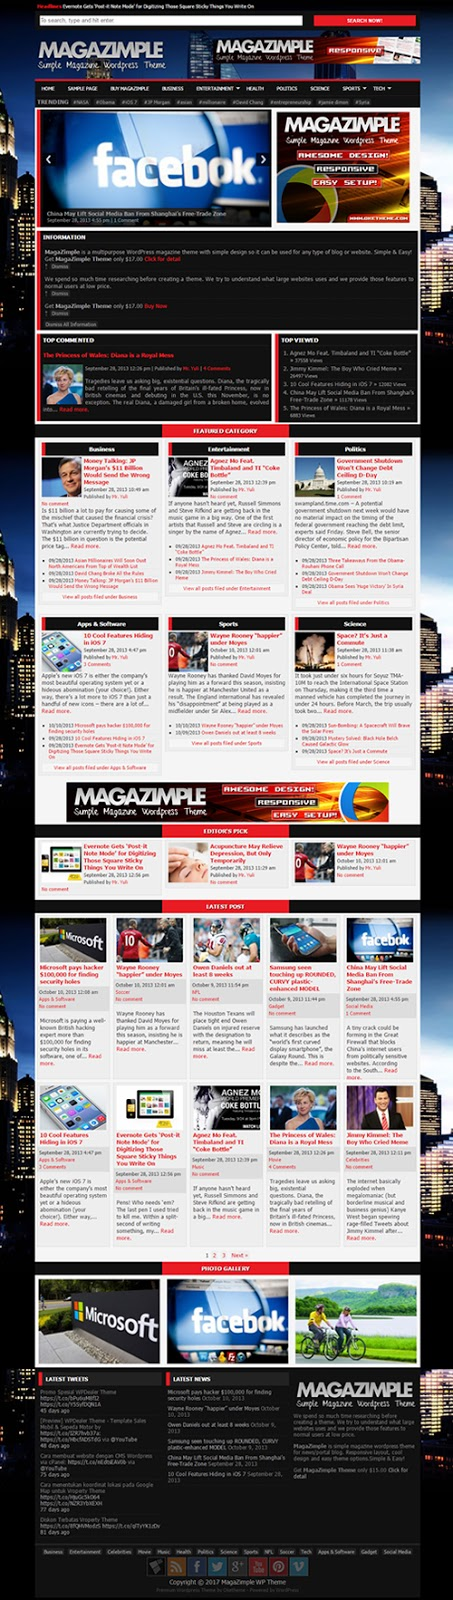 Jasa Design Website Portal Berita Termurah | Menuu.id